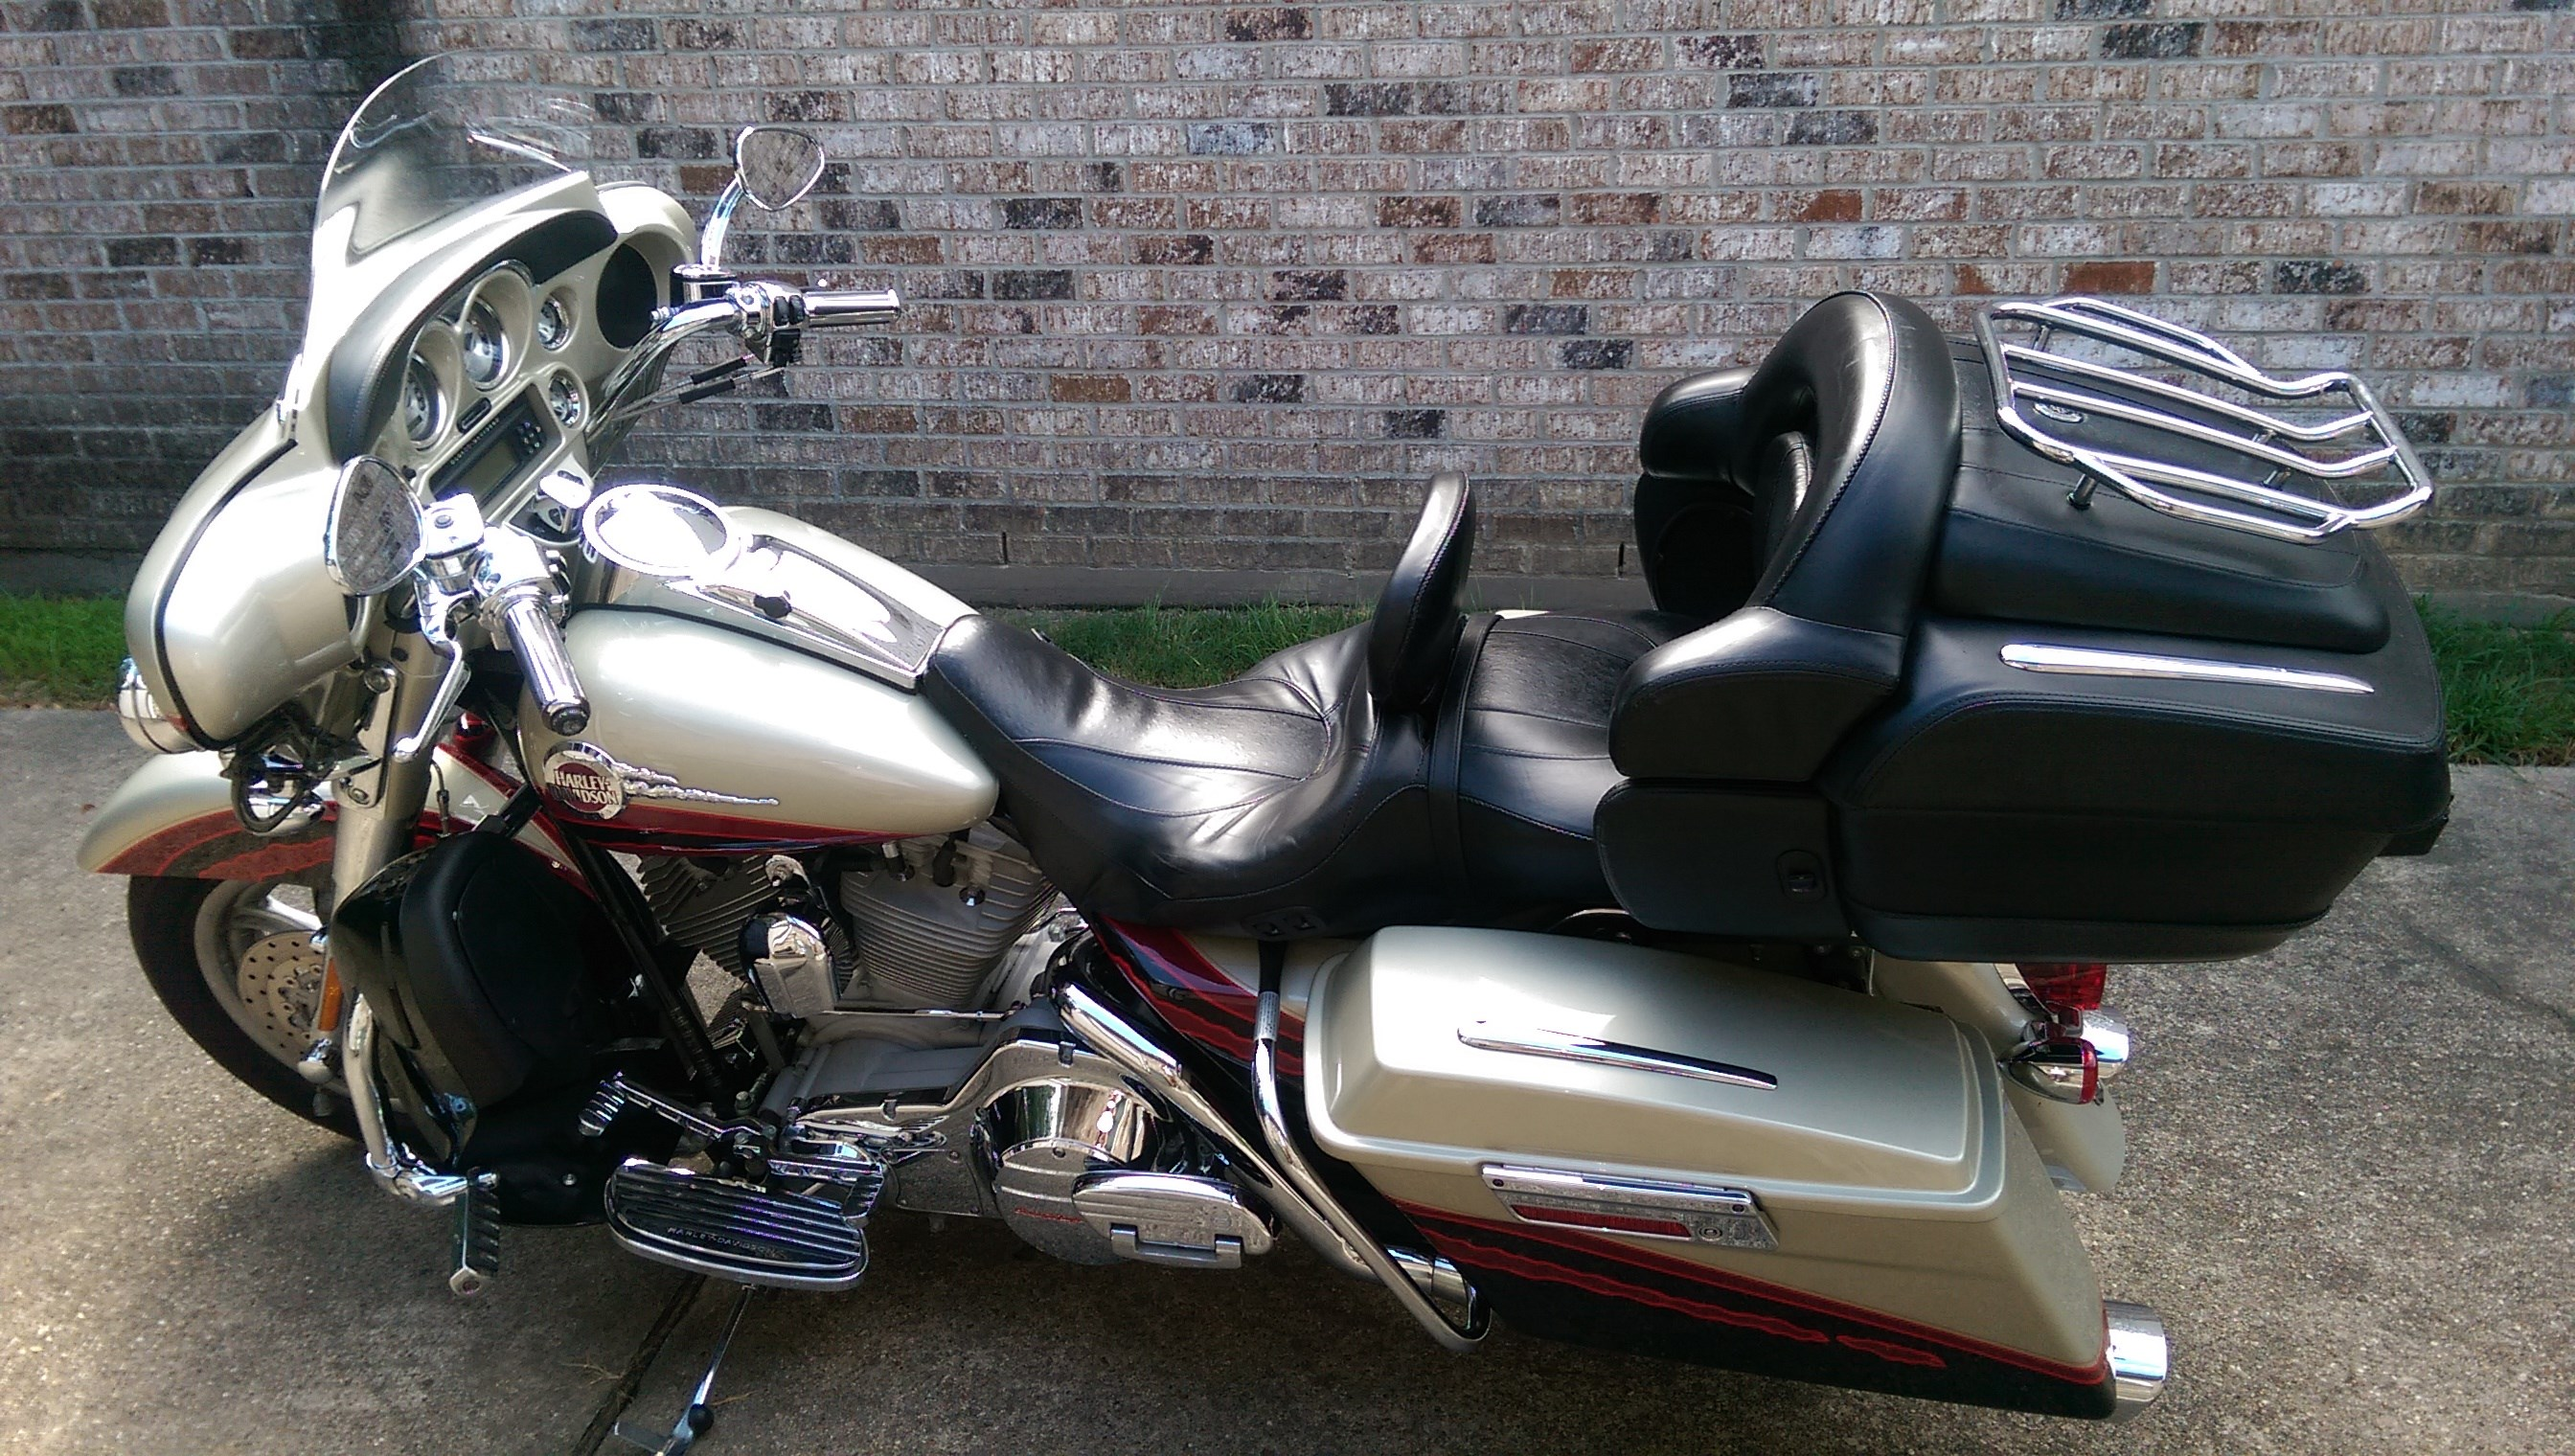 2017 Cvo For Sale Ga >> 2006 Harley-Davidson® FLHTCUSE Screamin' Eagle® Ultra Classic® Electra Glide® (Silver/Red/Black ...